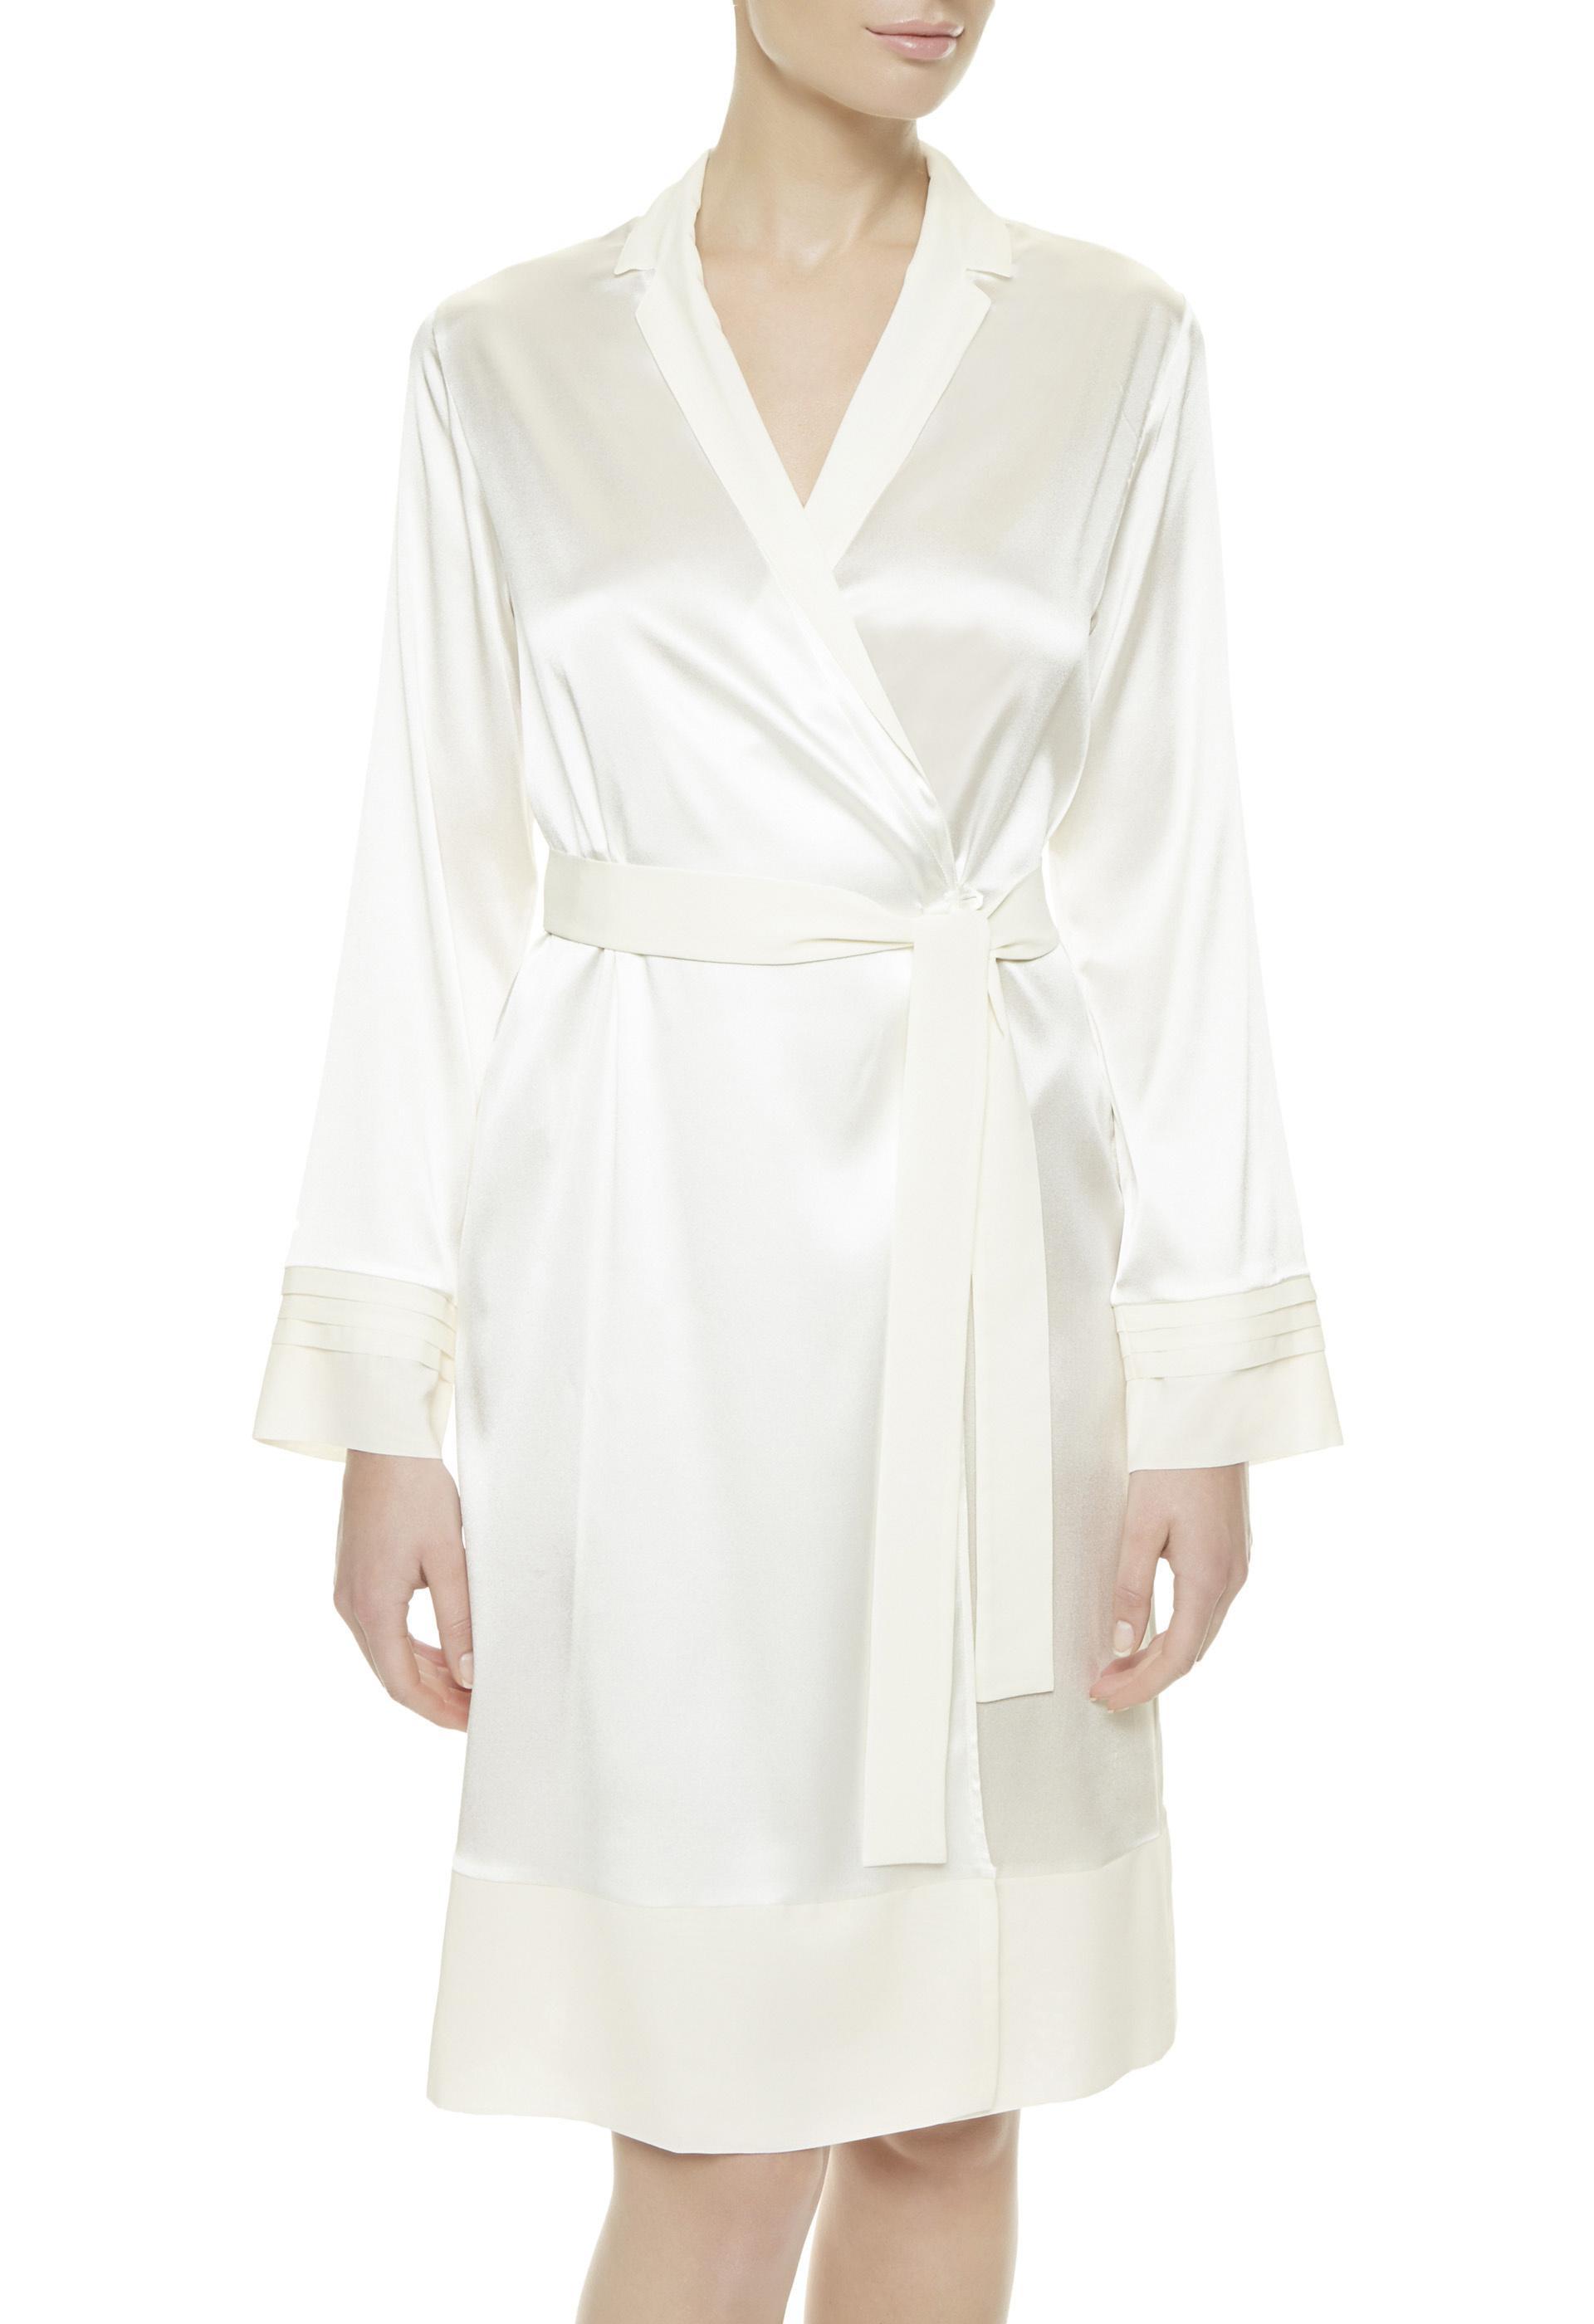 Lyst - La Perla Silk Essence Short Dressing Gown in White f1c219640